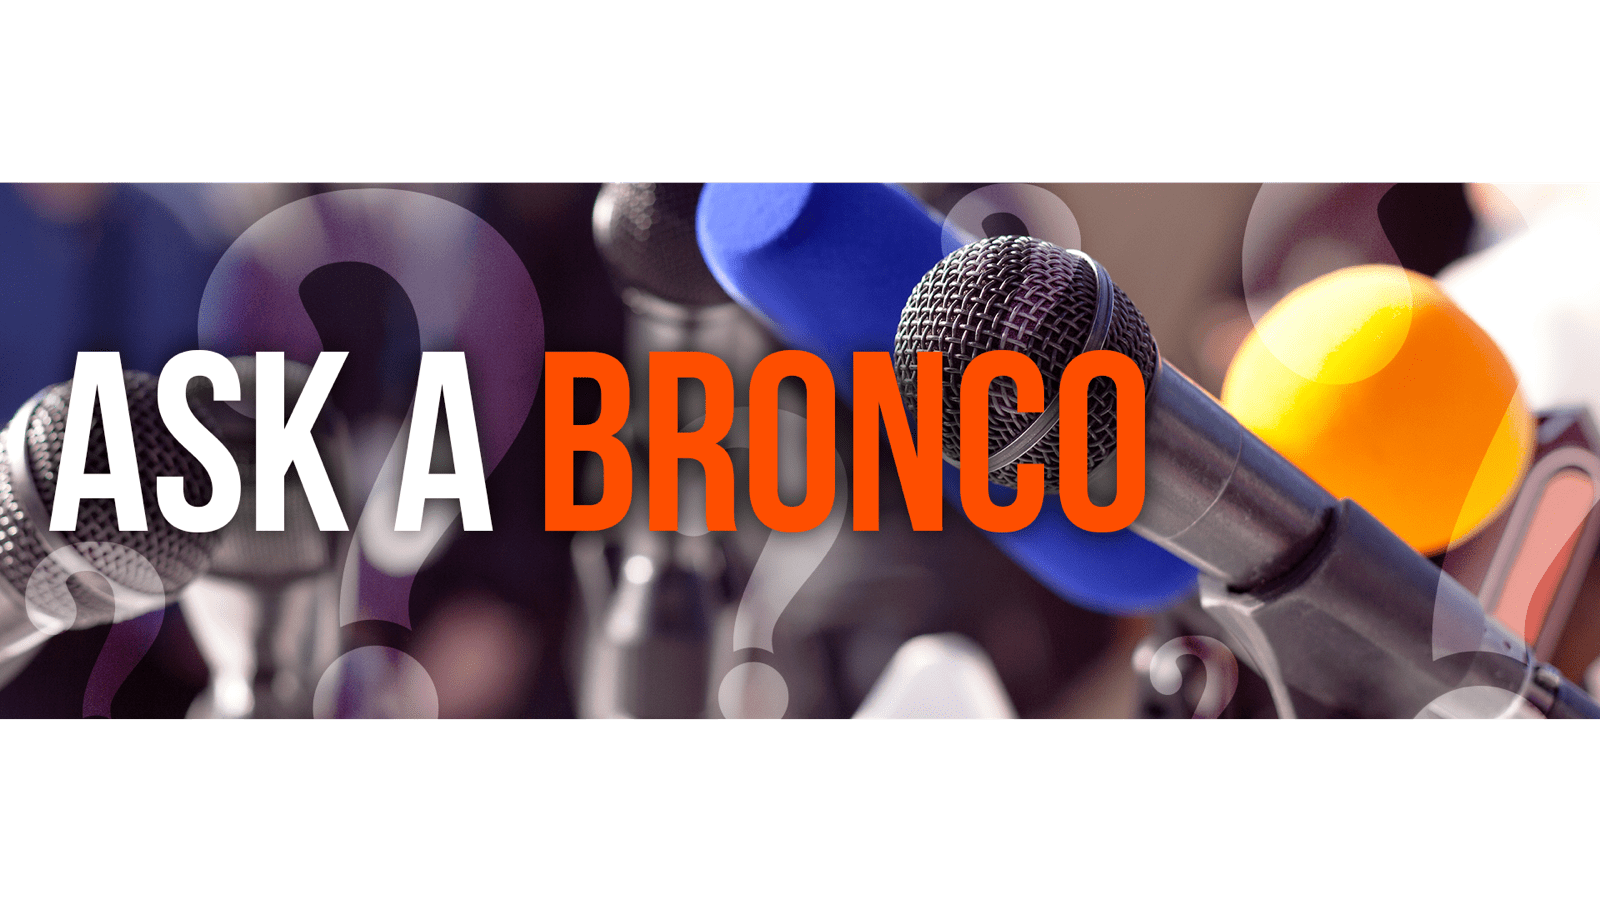 Ask A Bronco